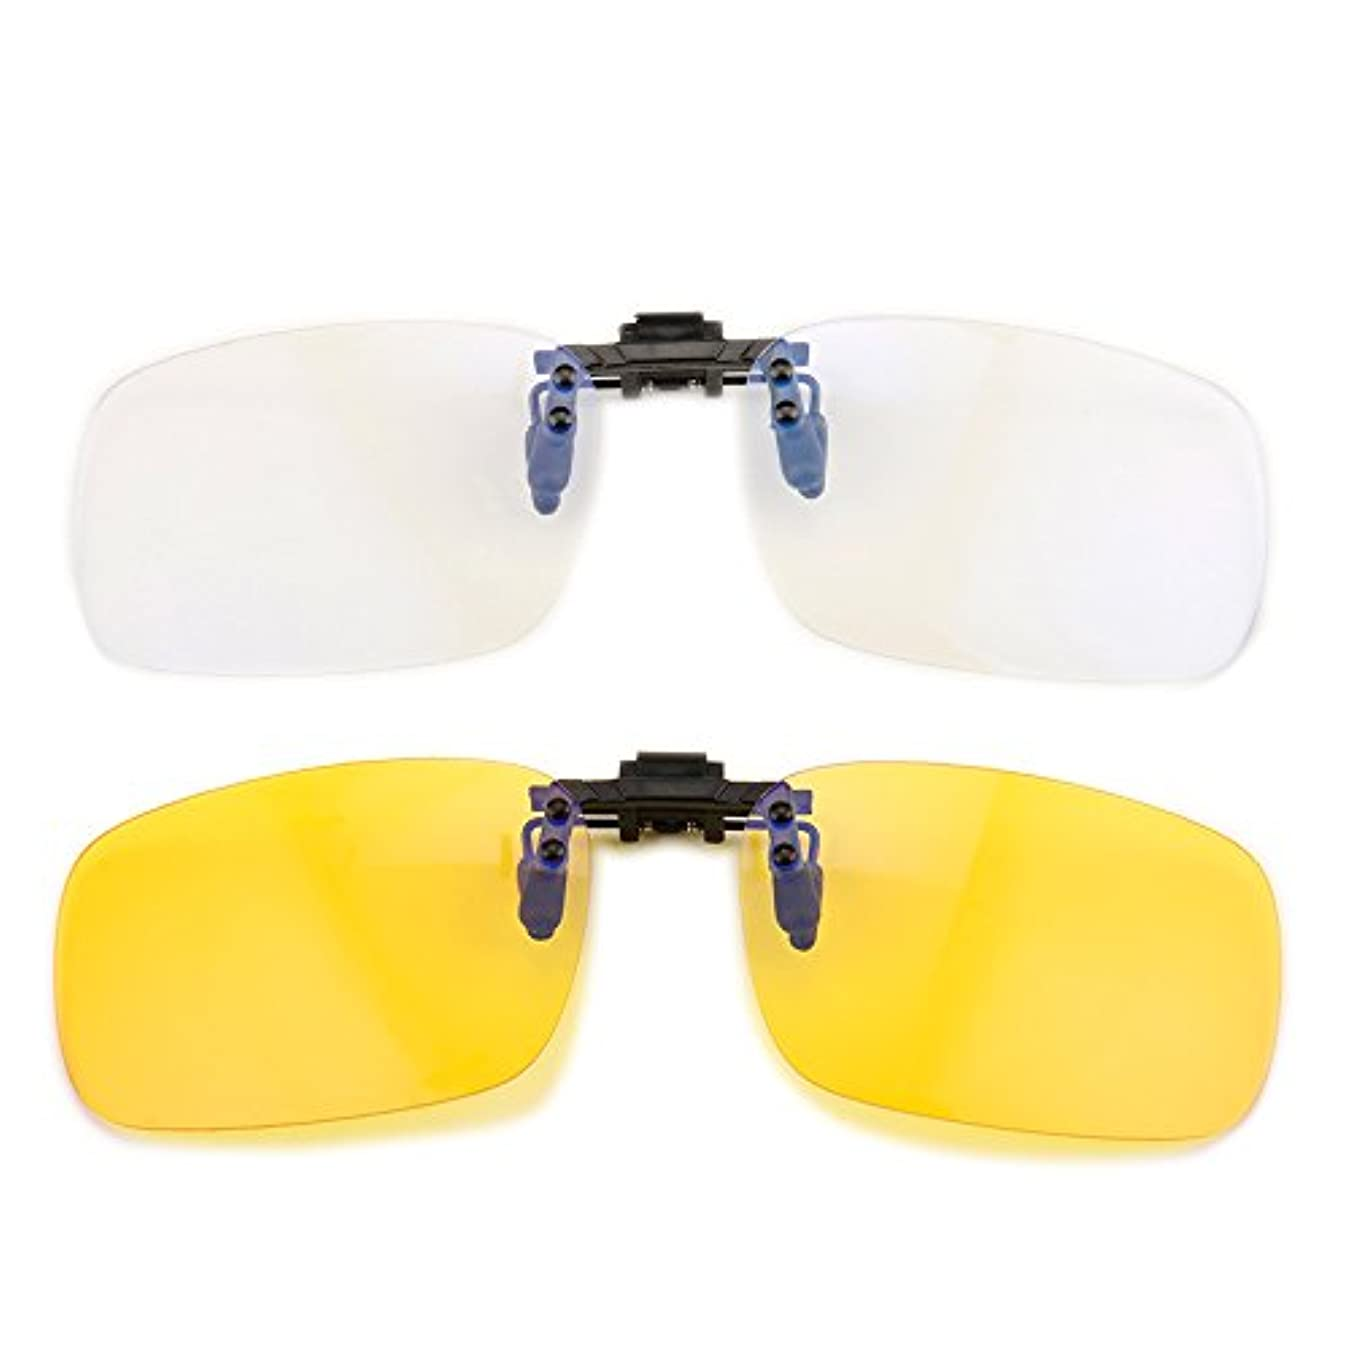 Gudzws 抗青色光フィルターメガネのクリップは、眼の緊張をブロック 白、黄色